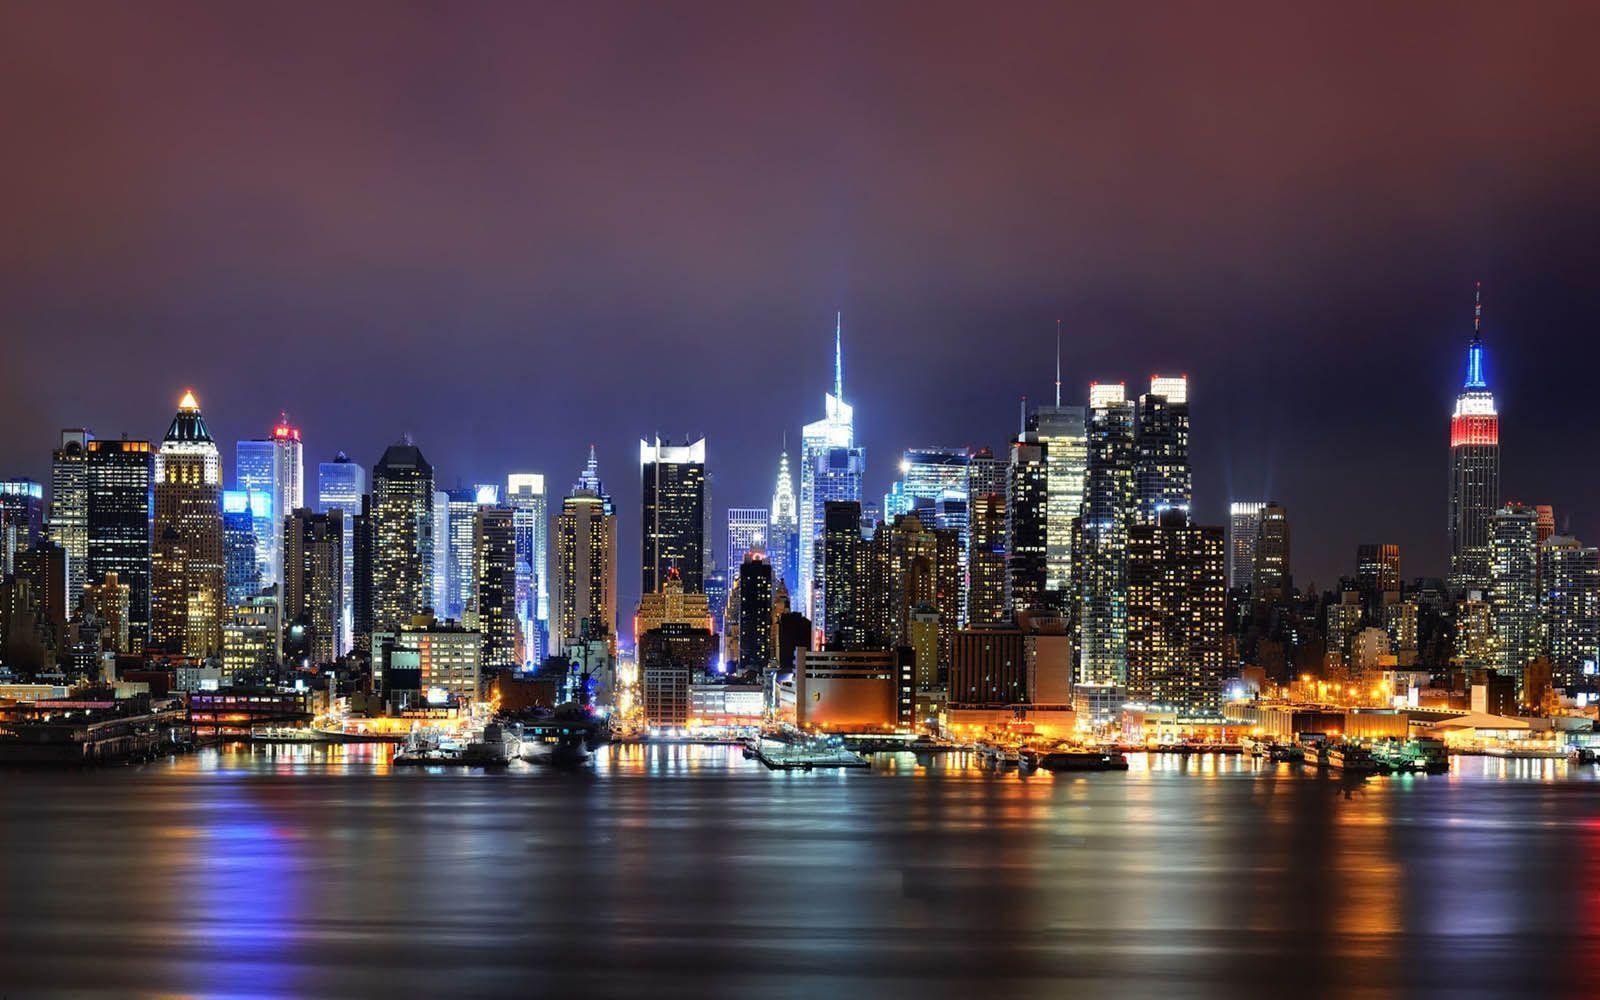 pin city nightlife wallpaper - photo #13